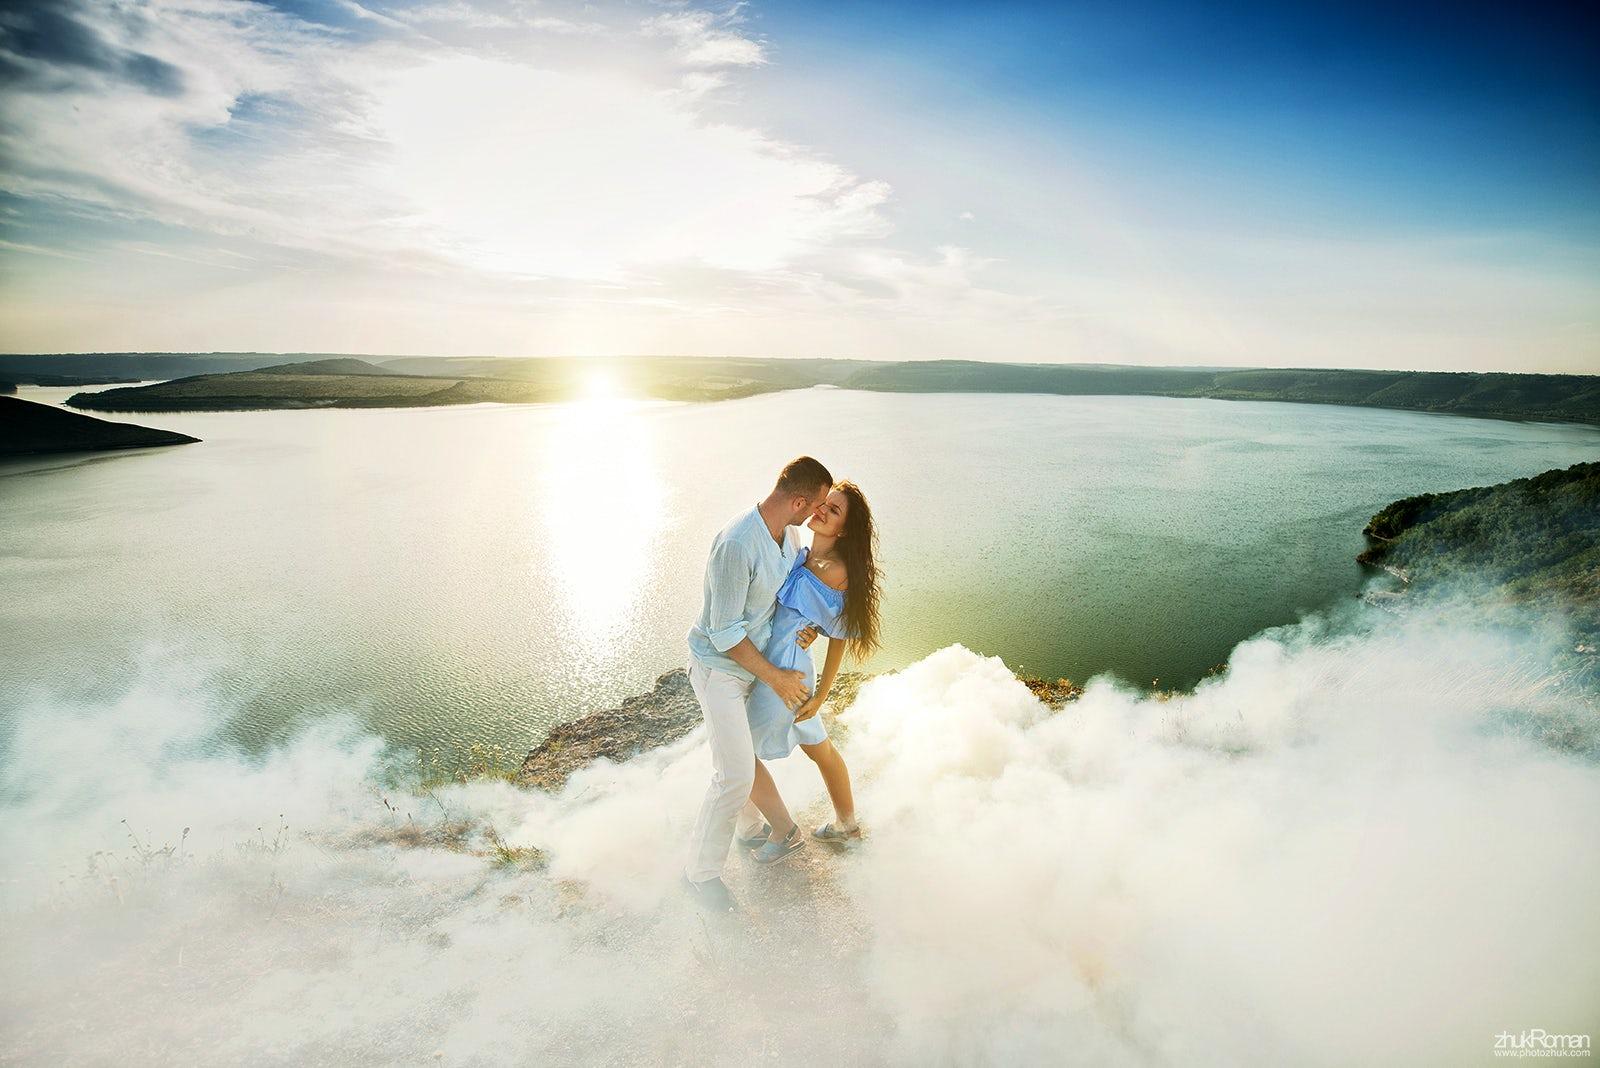 Cover photo © credits: photographer Roman Zhuk